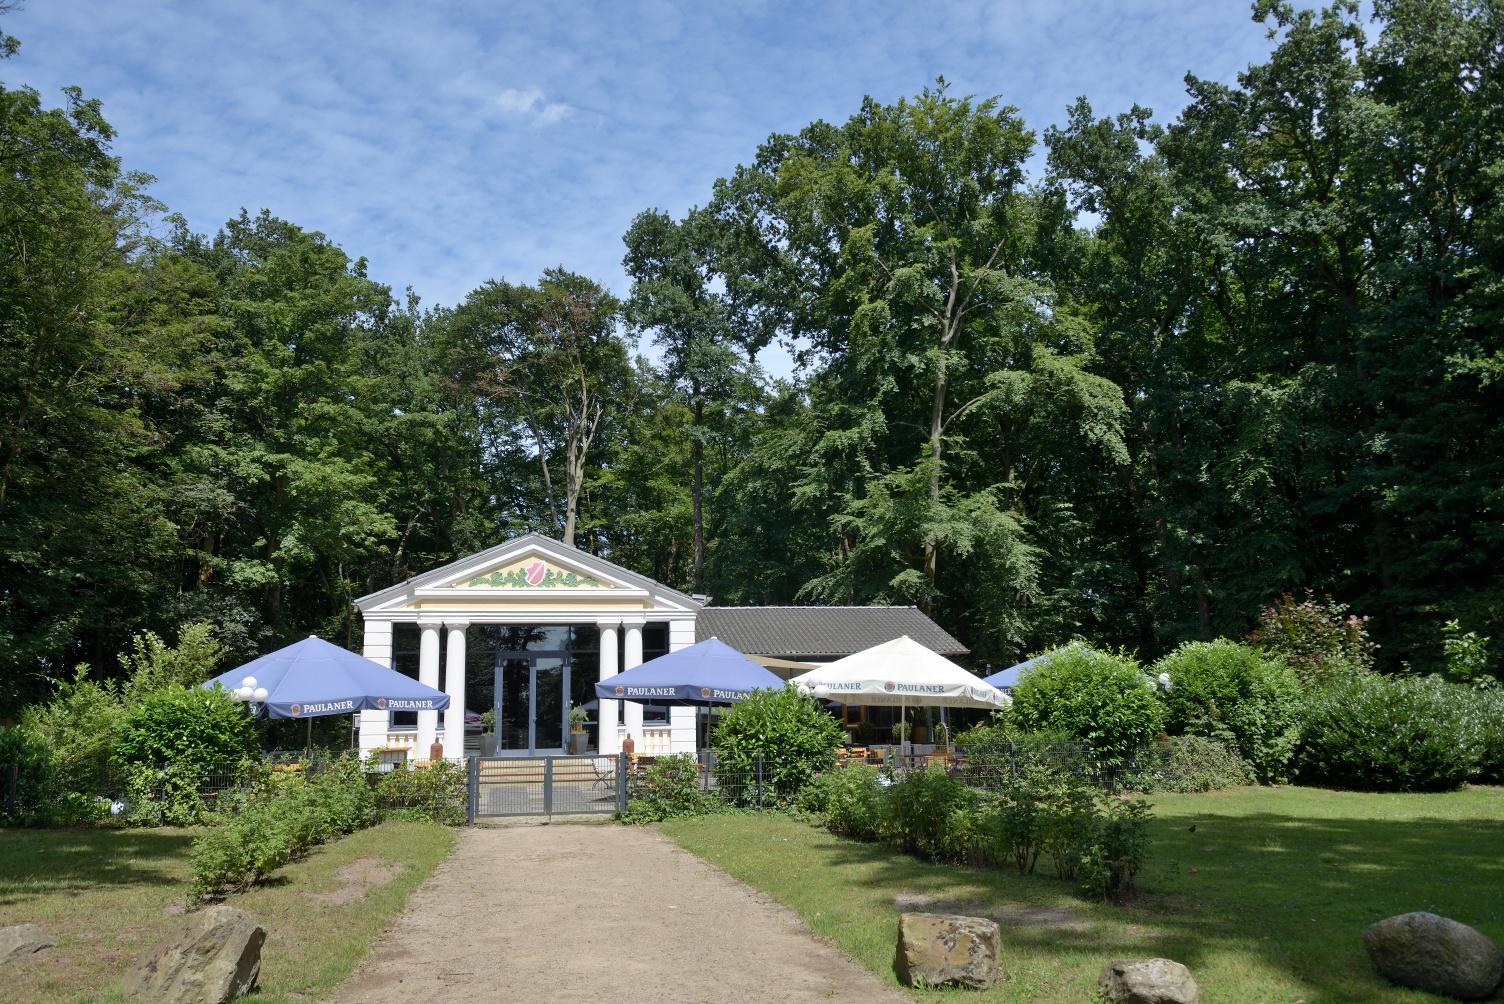 Parkvilla im Stadtpark